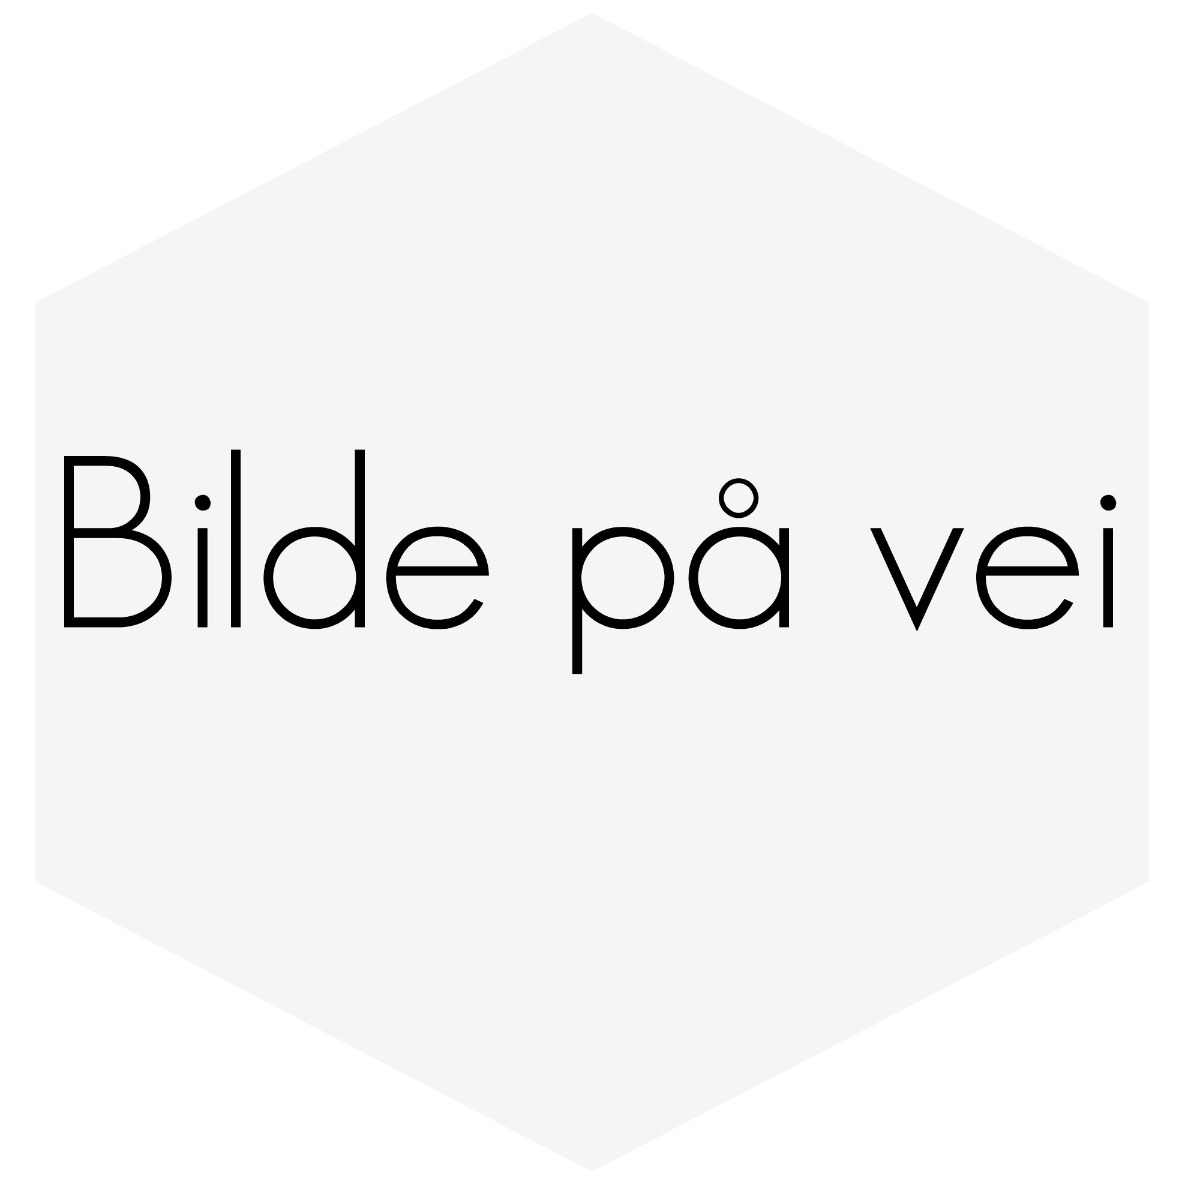 STØTDEMPER SPORT BILSTEIN B6 140/160 FORAN pris stk